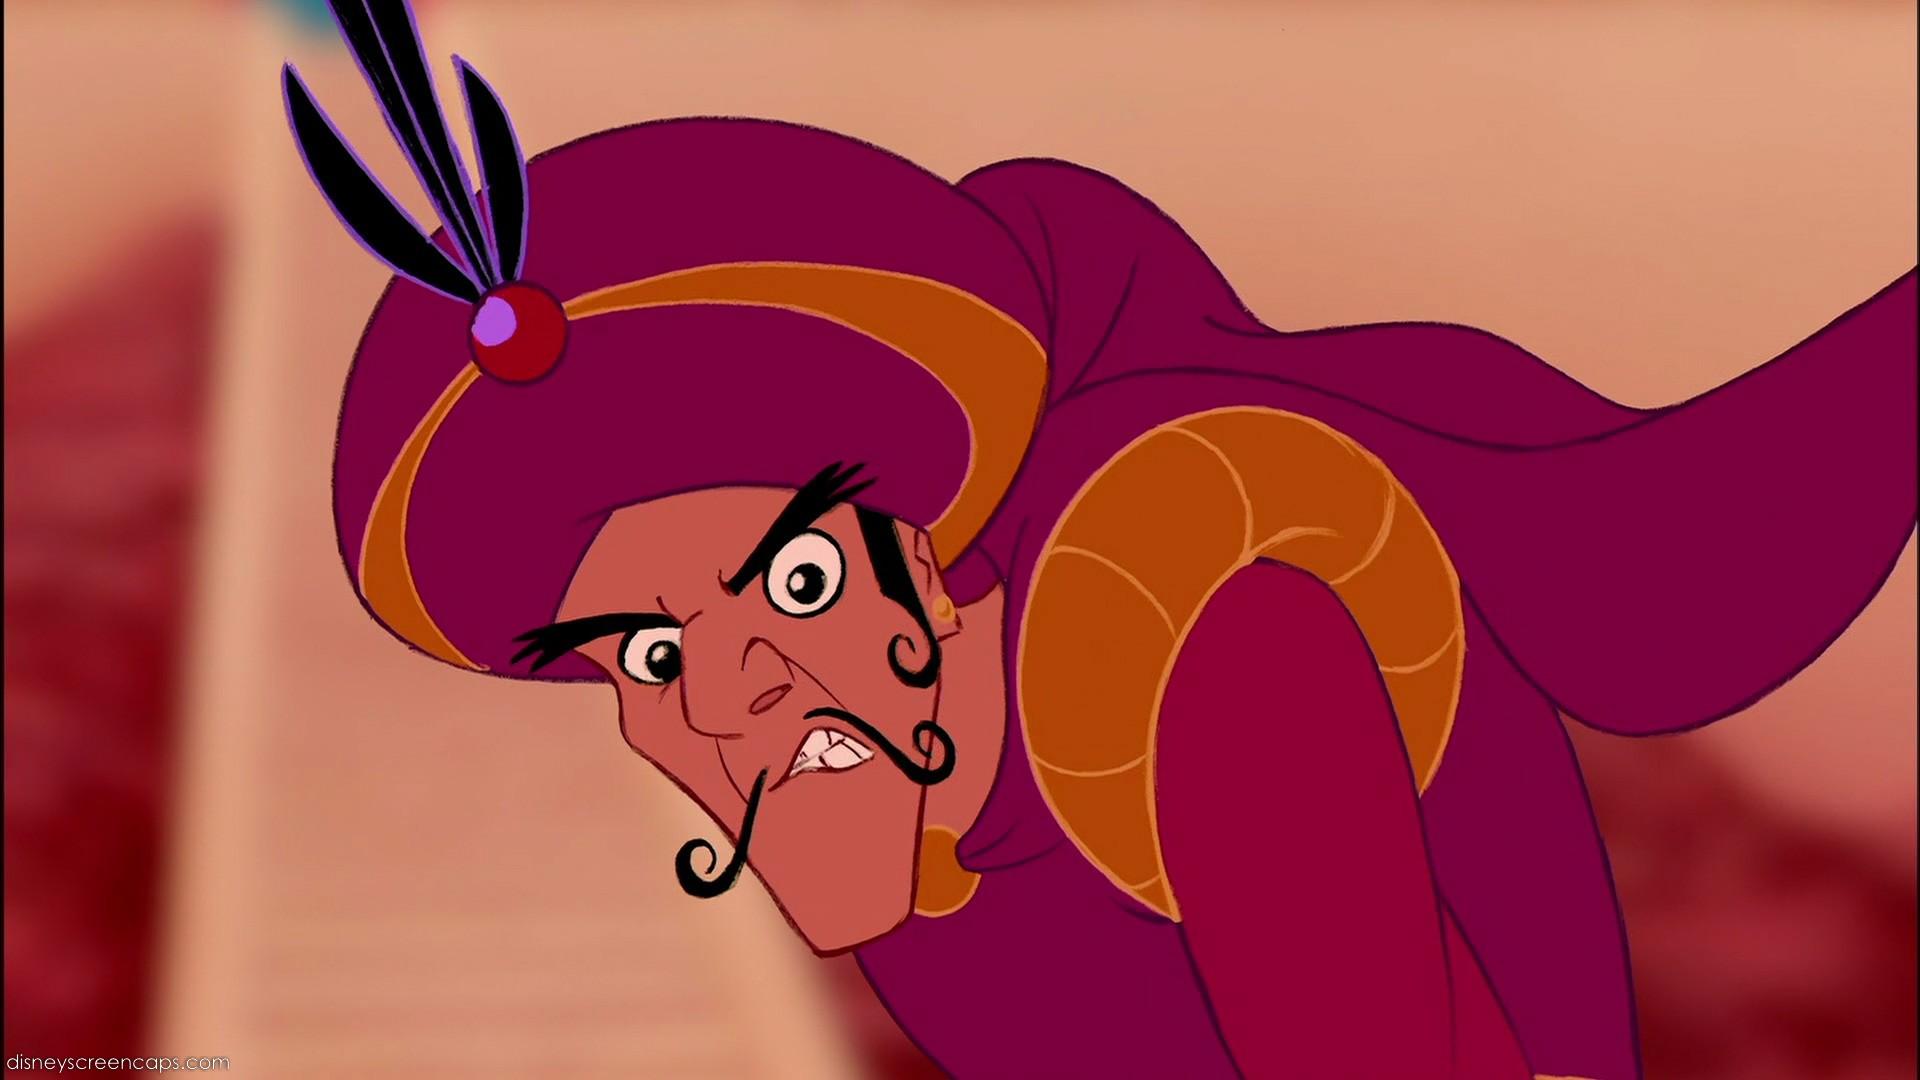 Aladdin: Prince Achmed